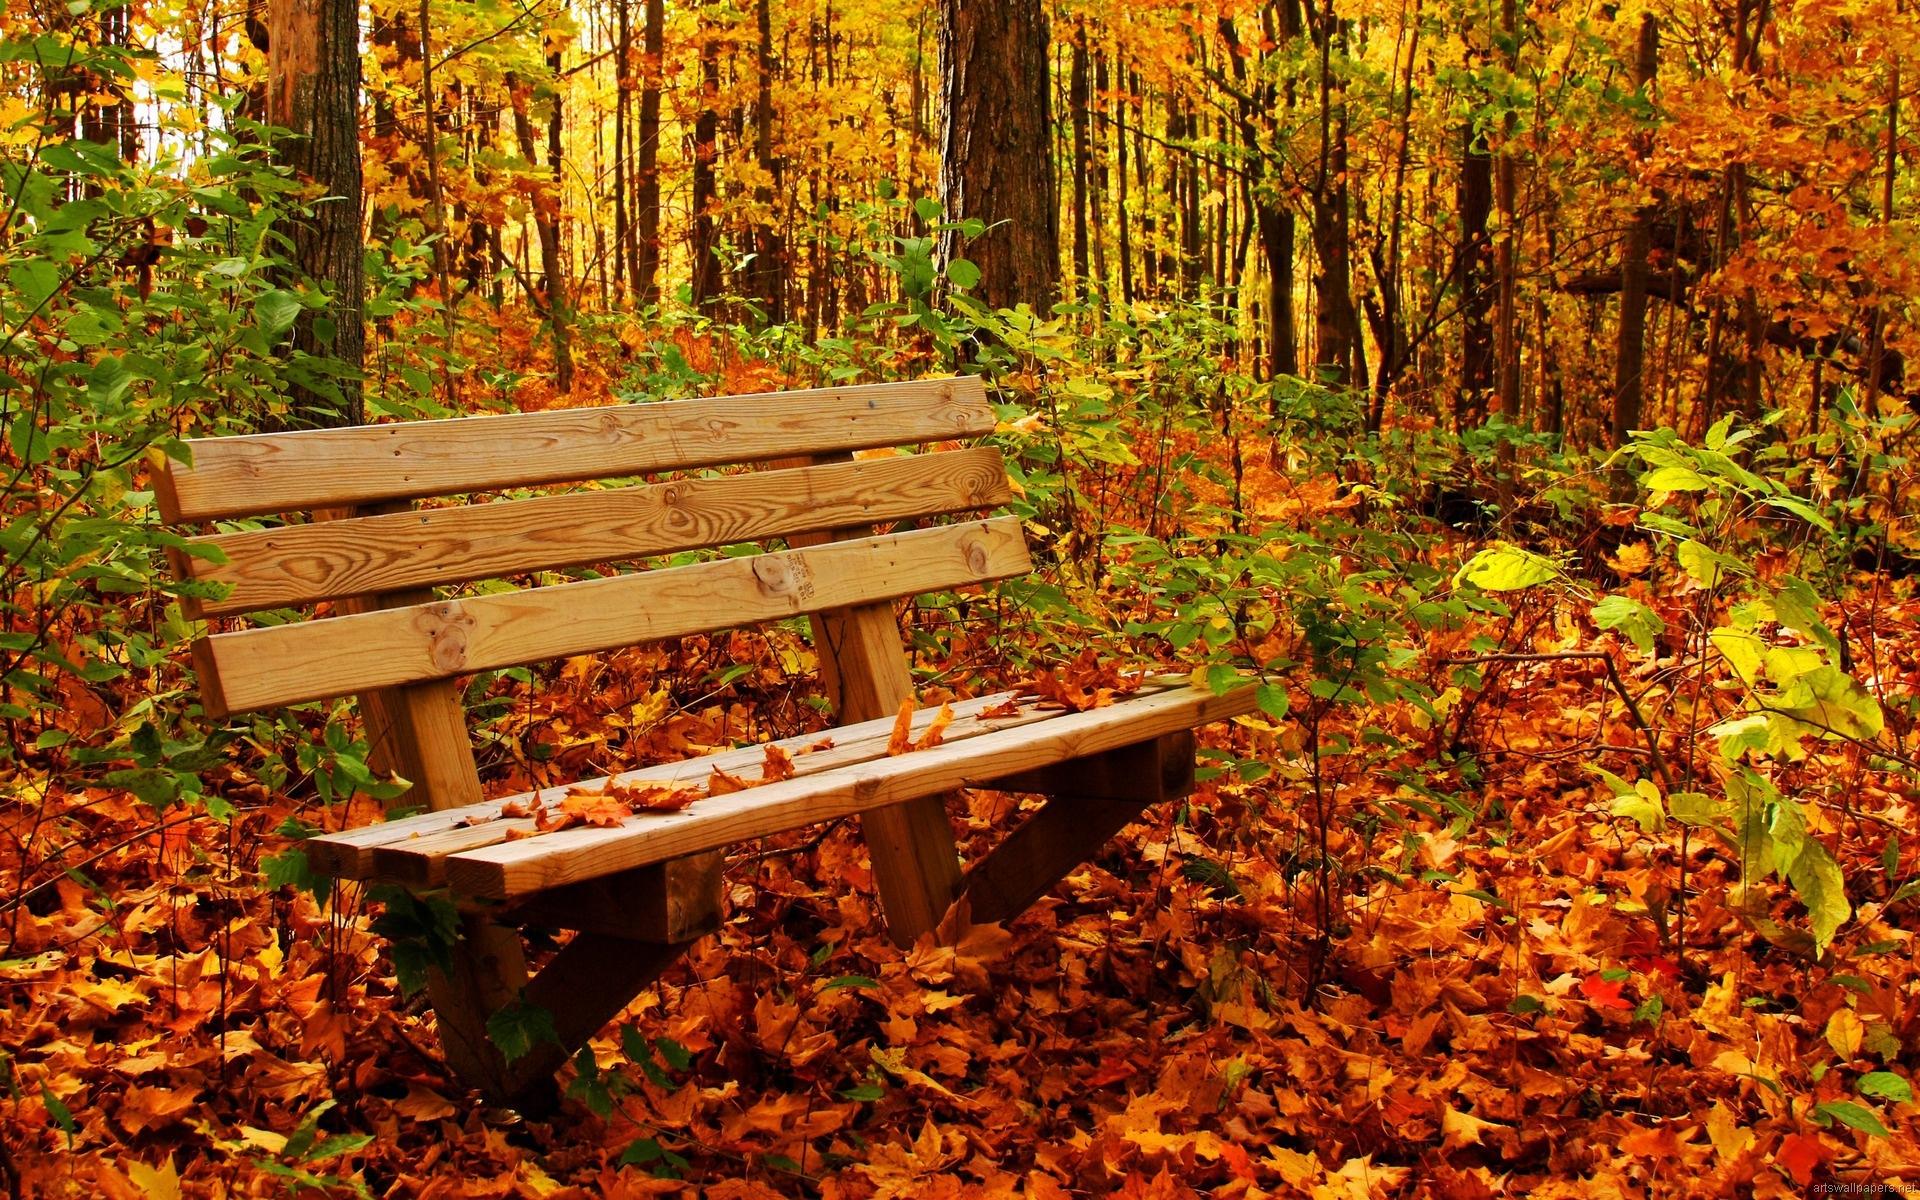 nature wallpaper full hd,natural landscape,nature,deciduous,bench,leaf